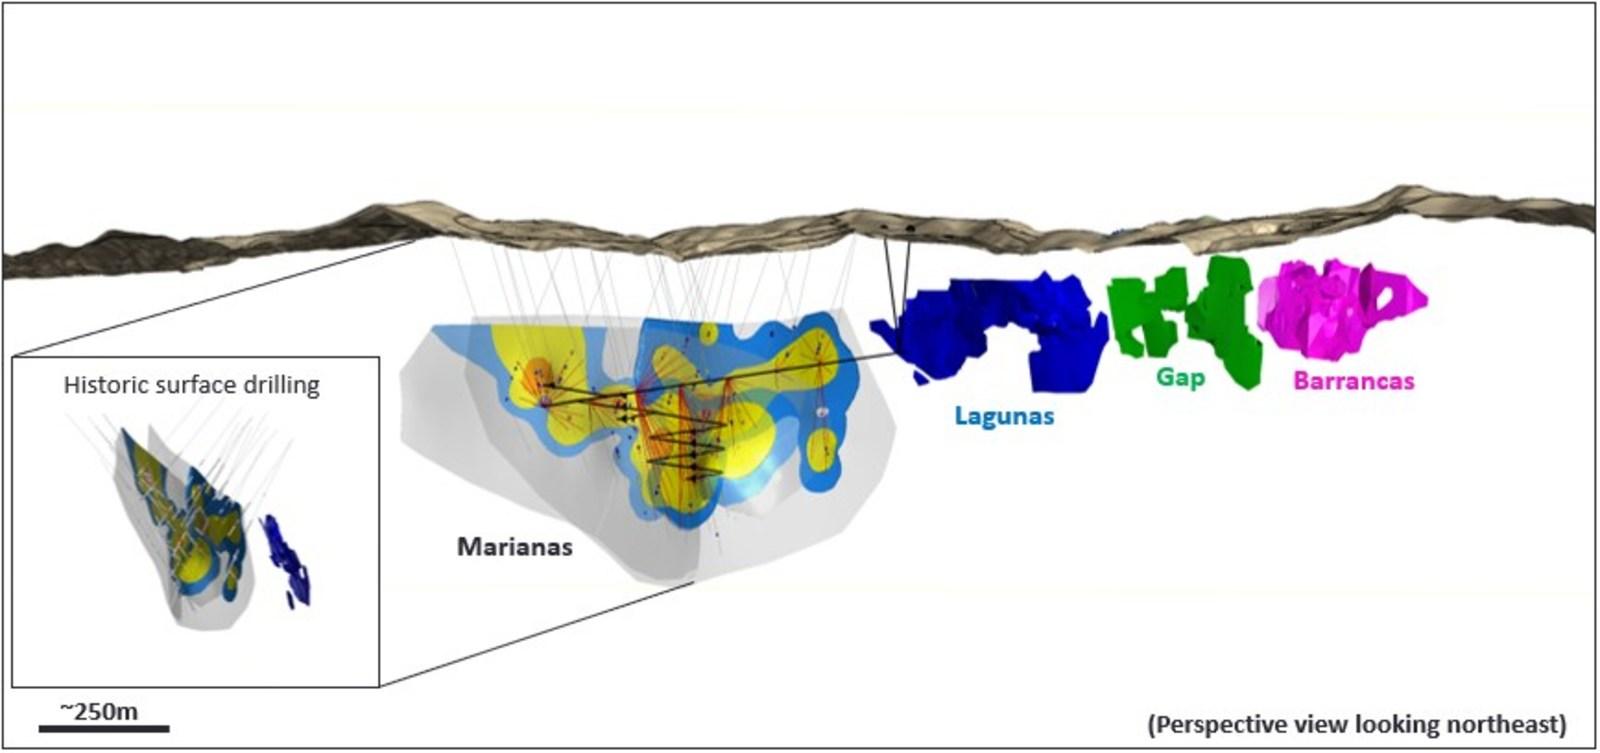 Figure 1 Marianas Zone located down-plunge of Lagunas